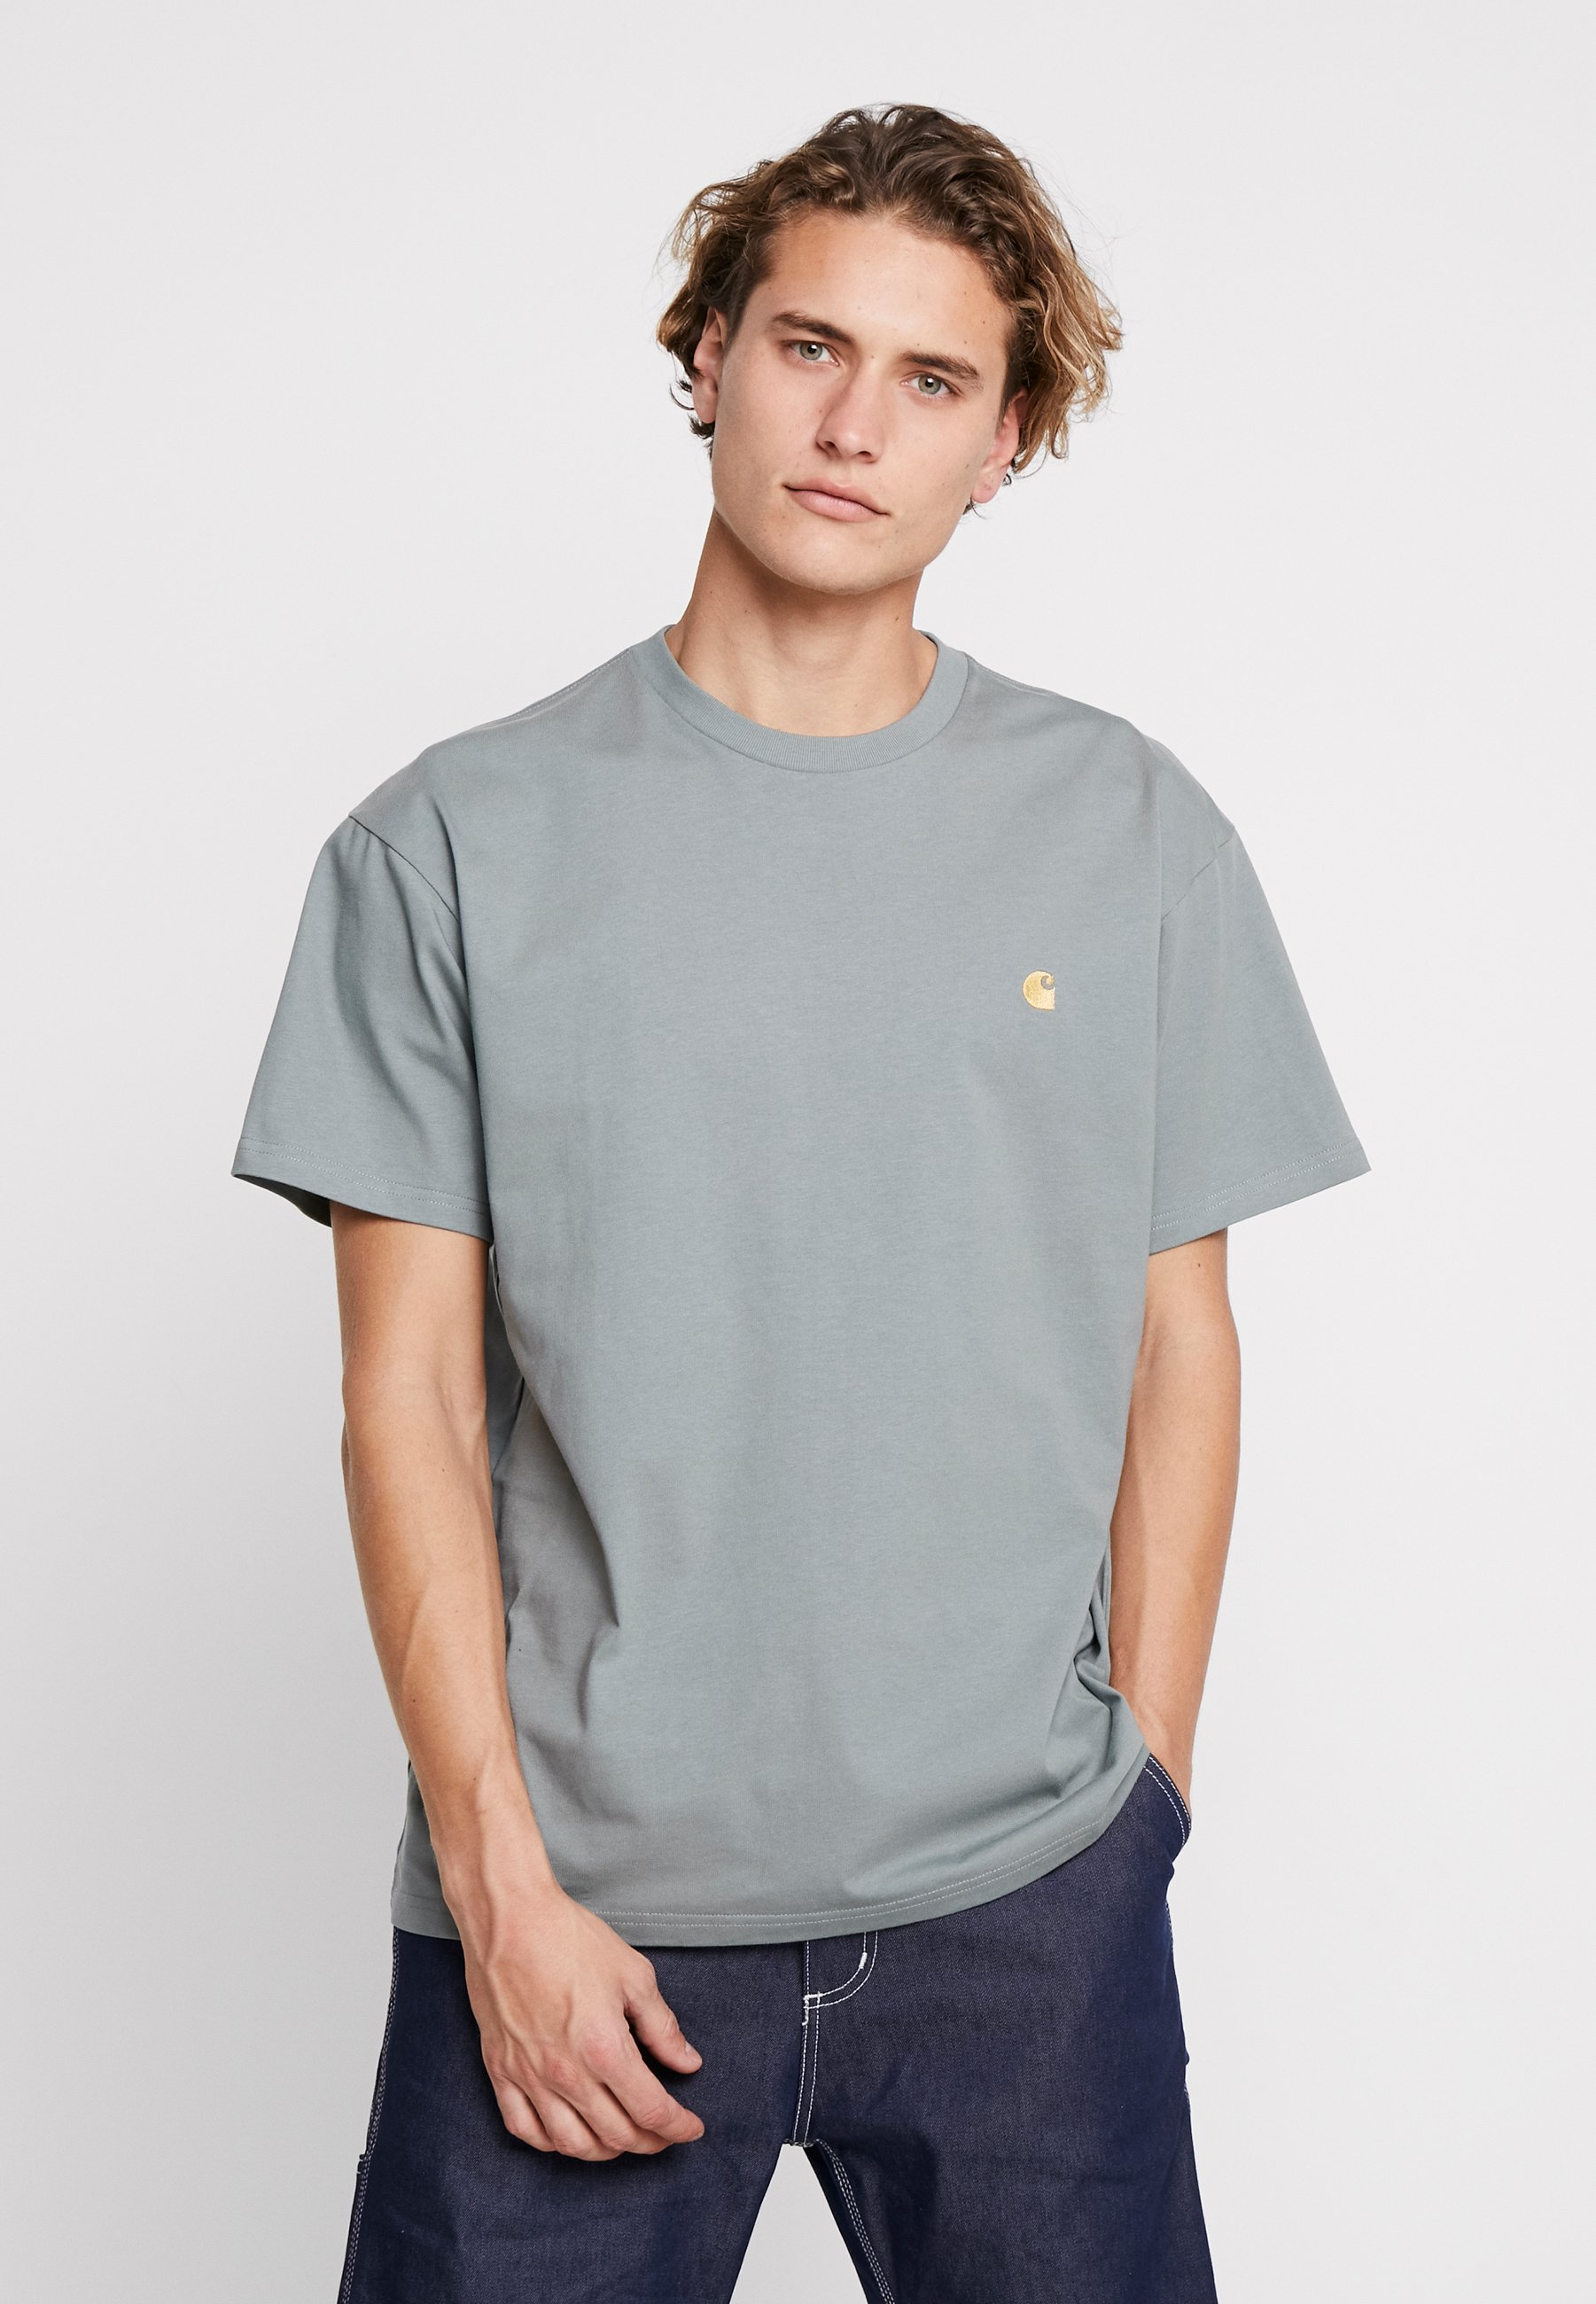 gold Carhartt shirt ChaseT Wip Basique Cloudy dQrsthC